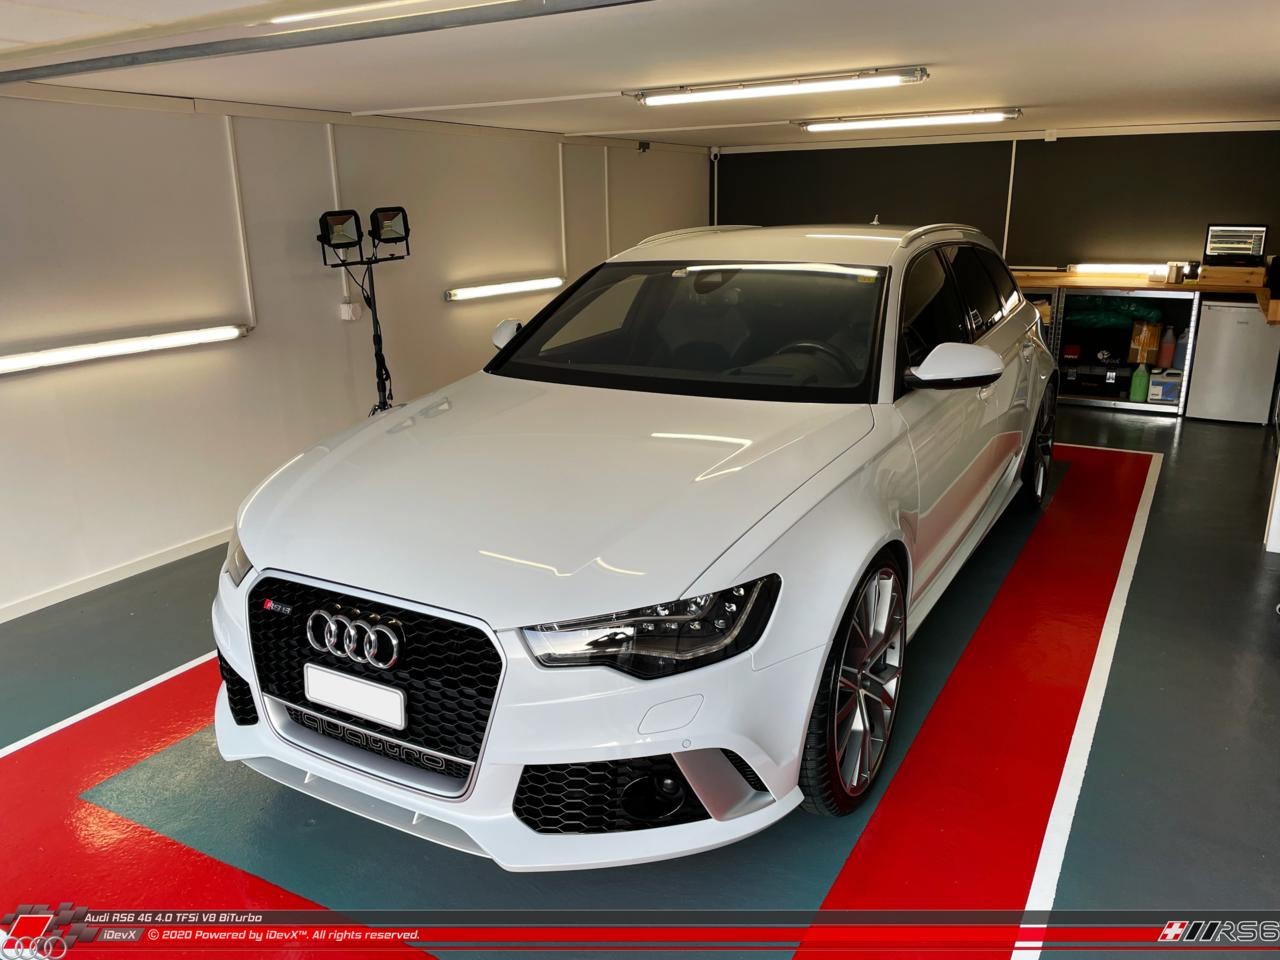 19.02.2021_Audi-RS6_iDevX_000.png